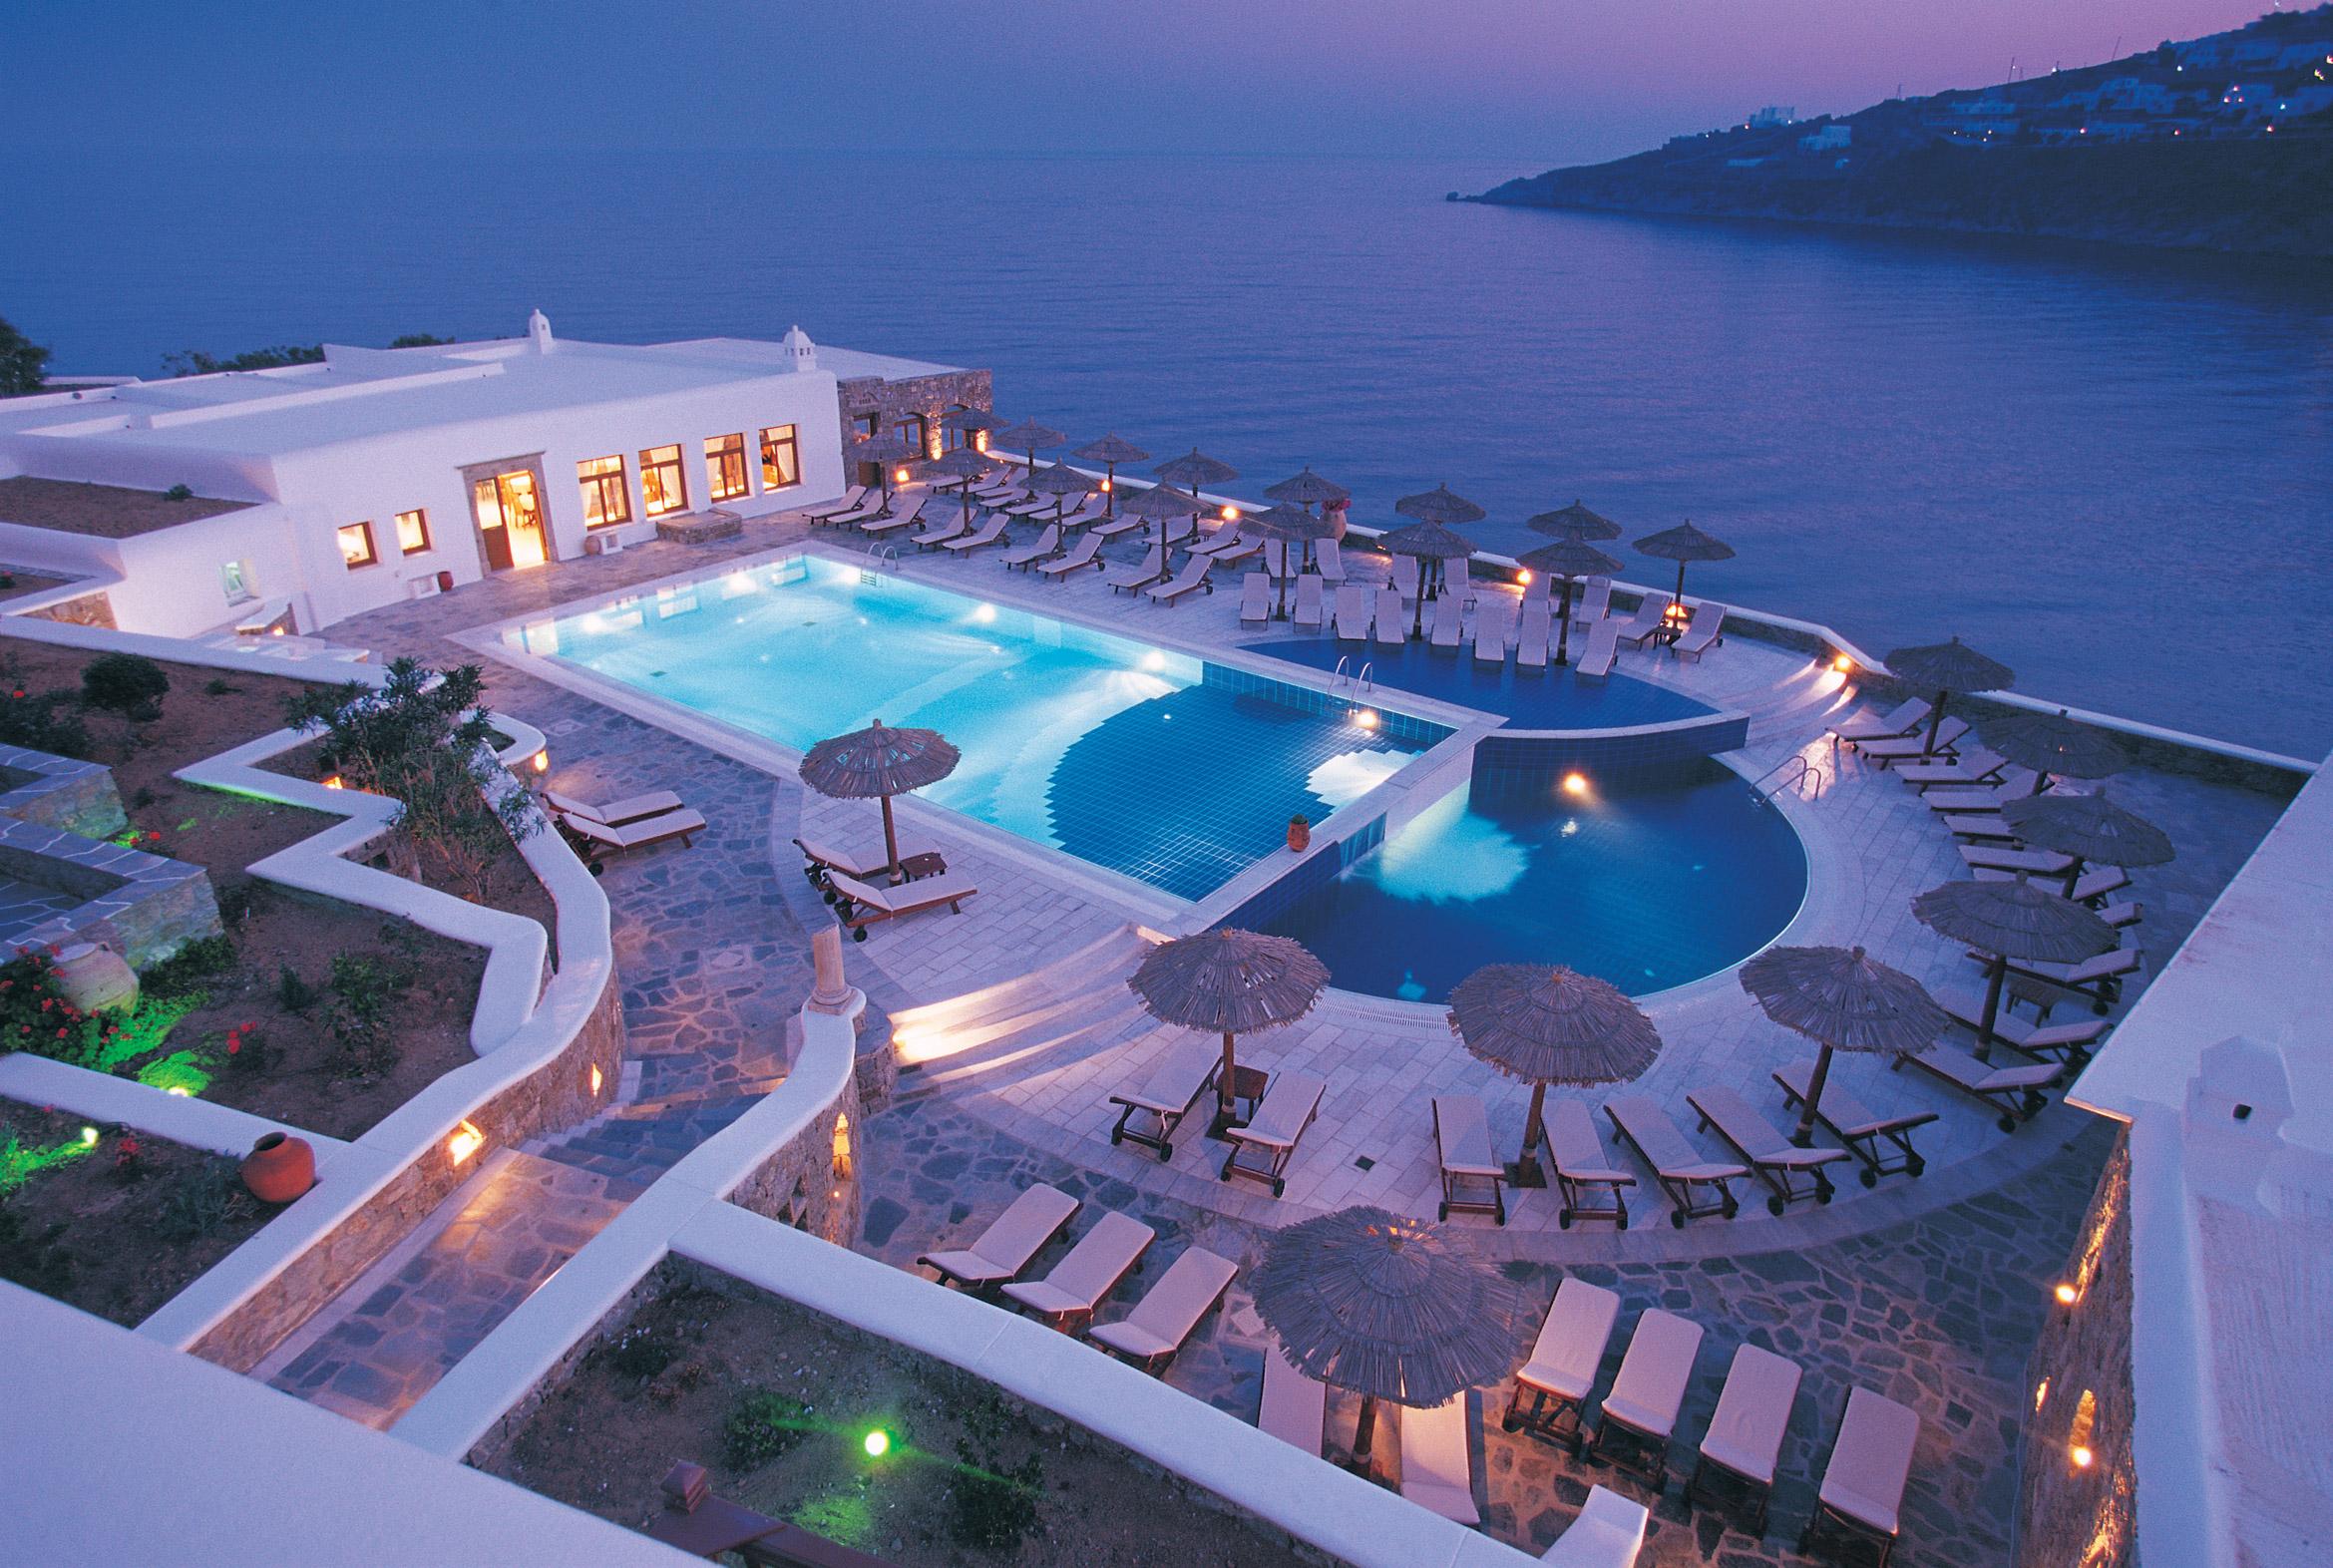 Petasos-Beach-Resort-Spa-Aerial-Night-001.jpg